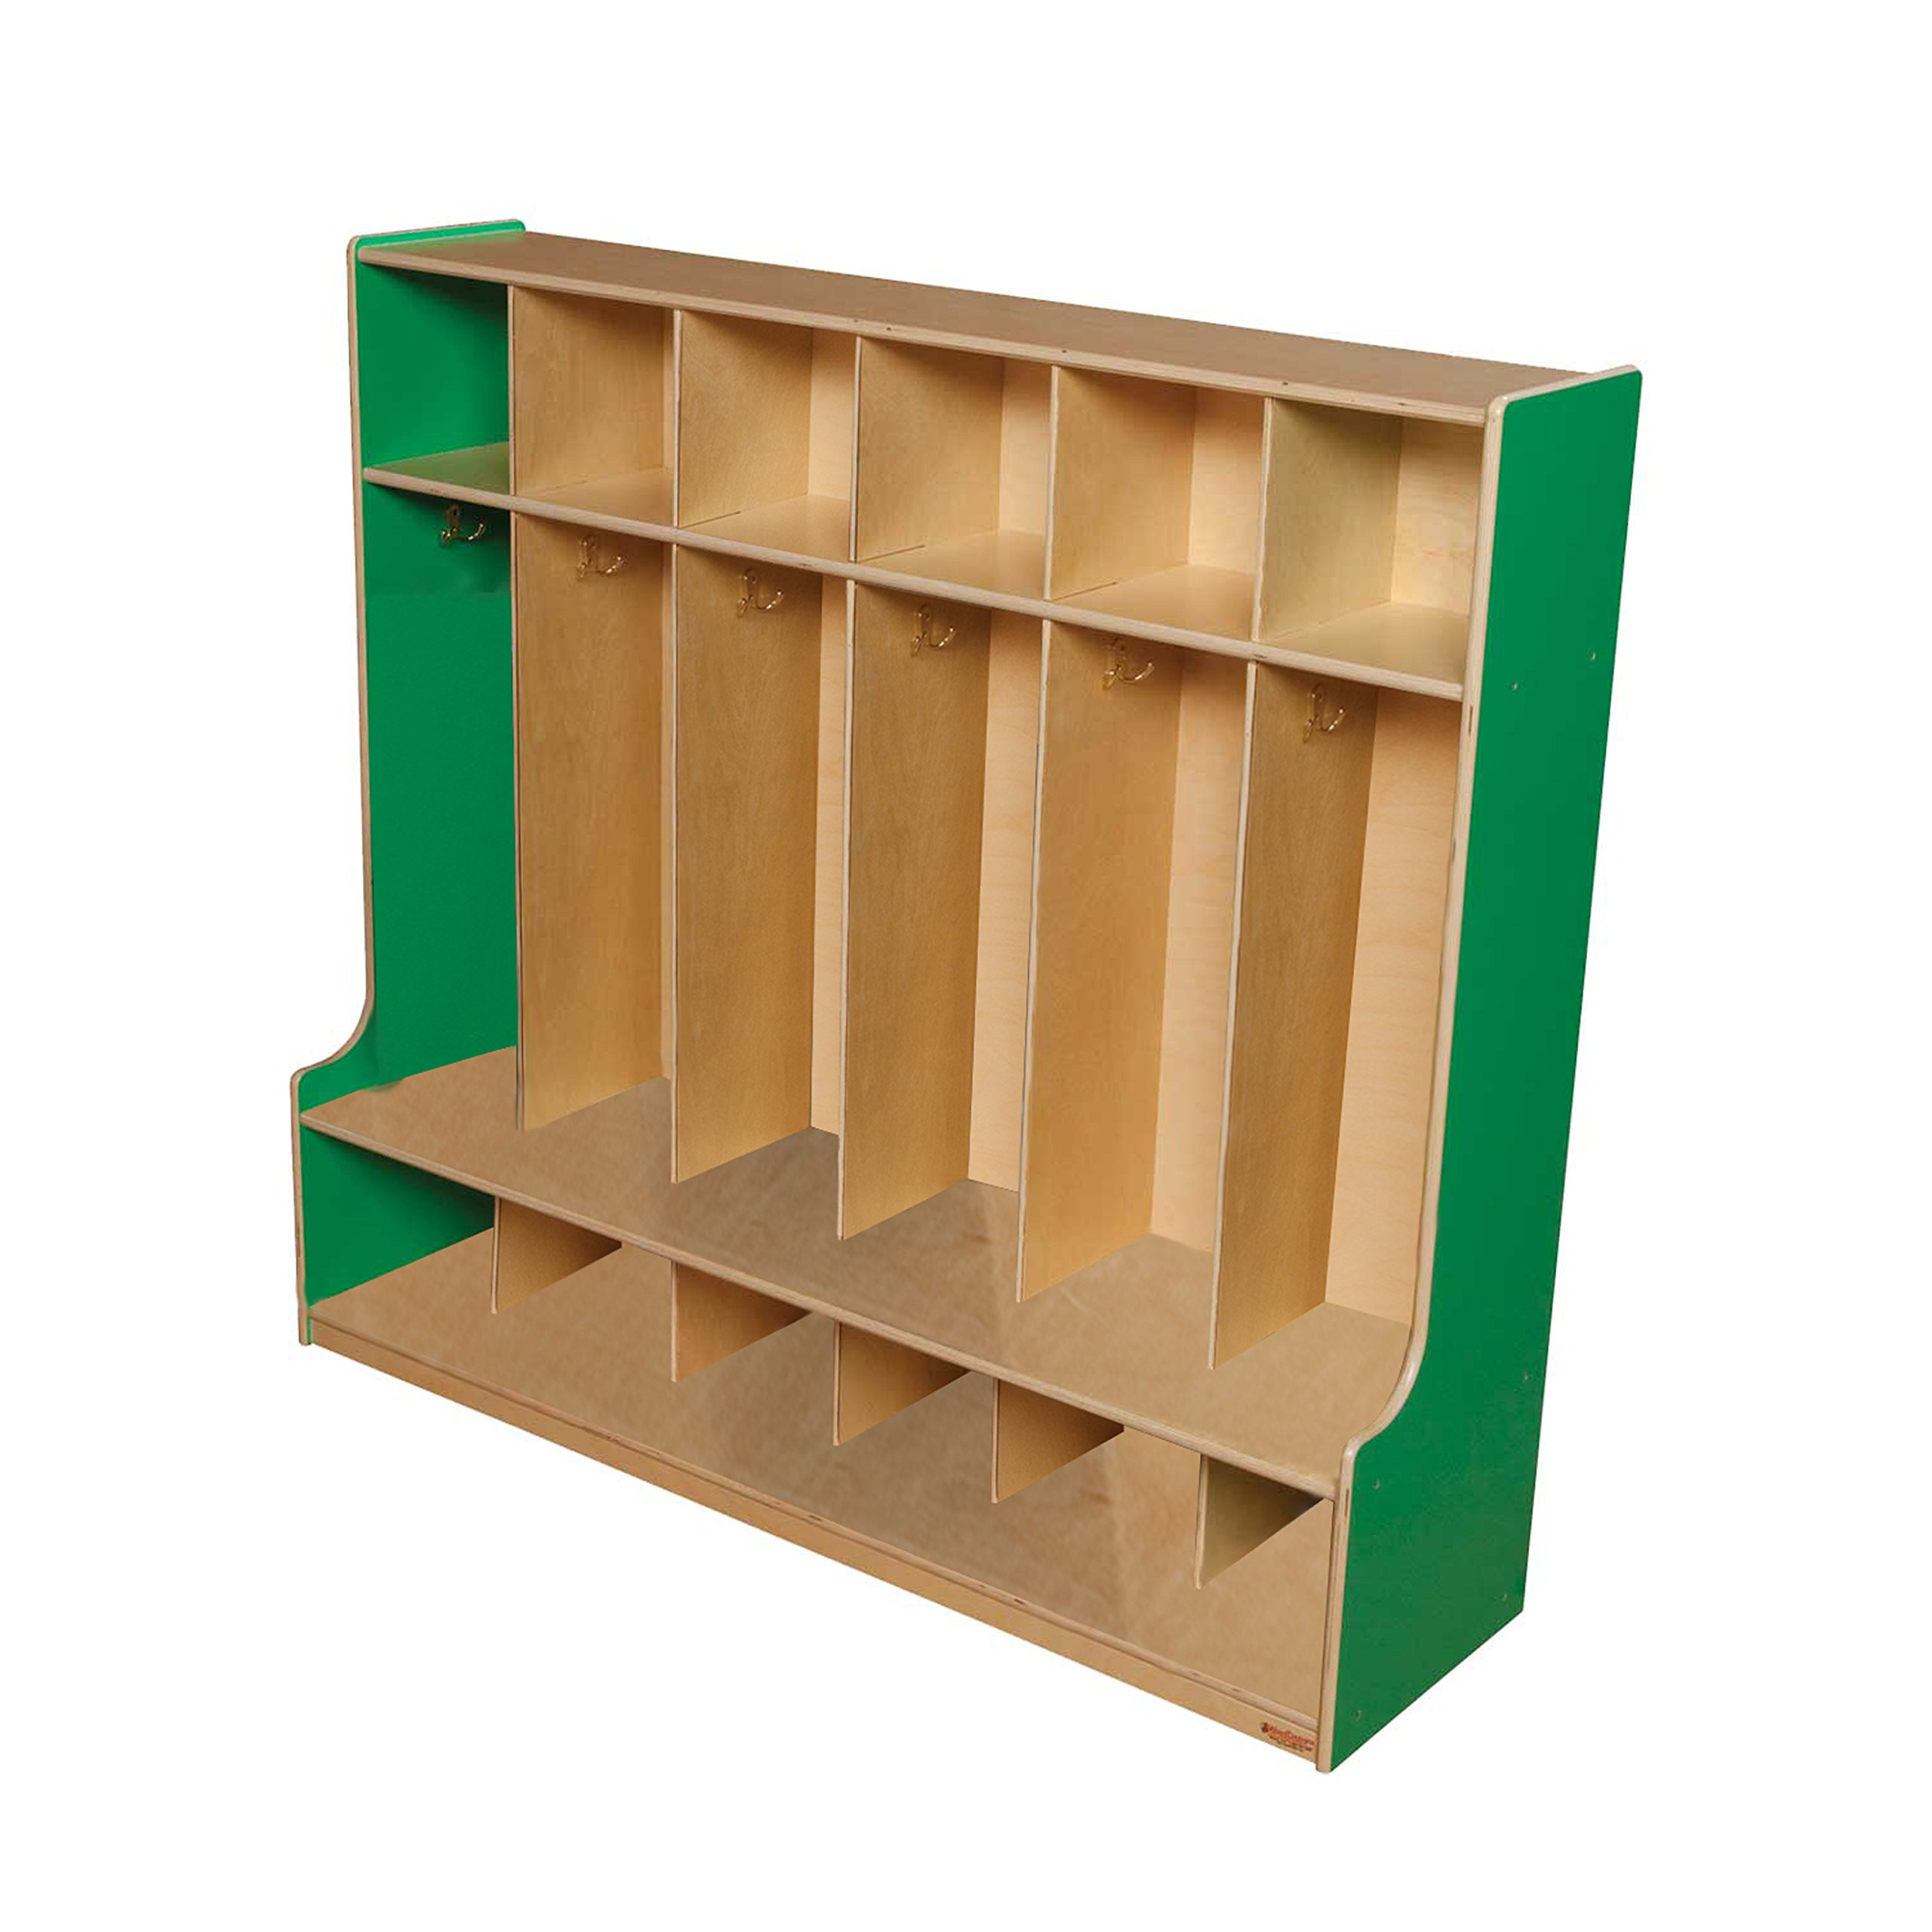 Wood Designs 51006G Green Apple 6 Section Seat Locker, 49'' Height, 18.5'' Width, 57'' Length